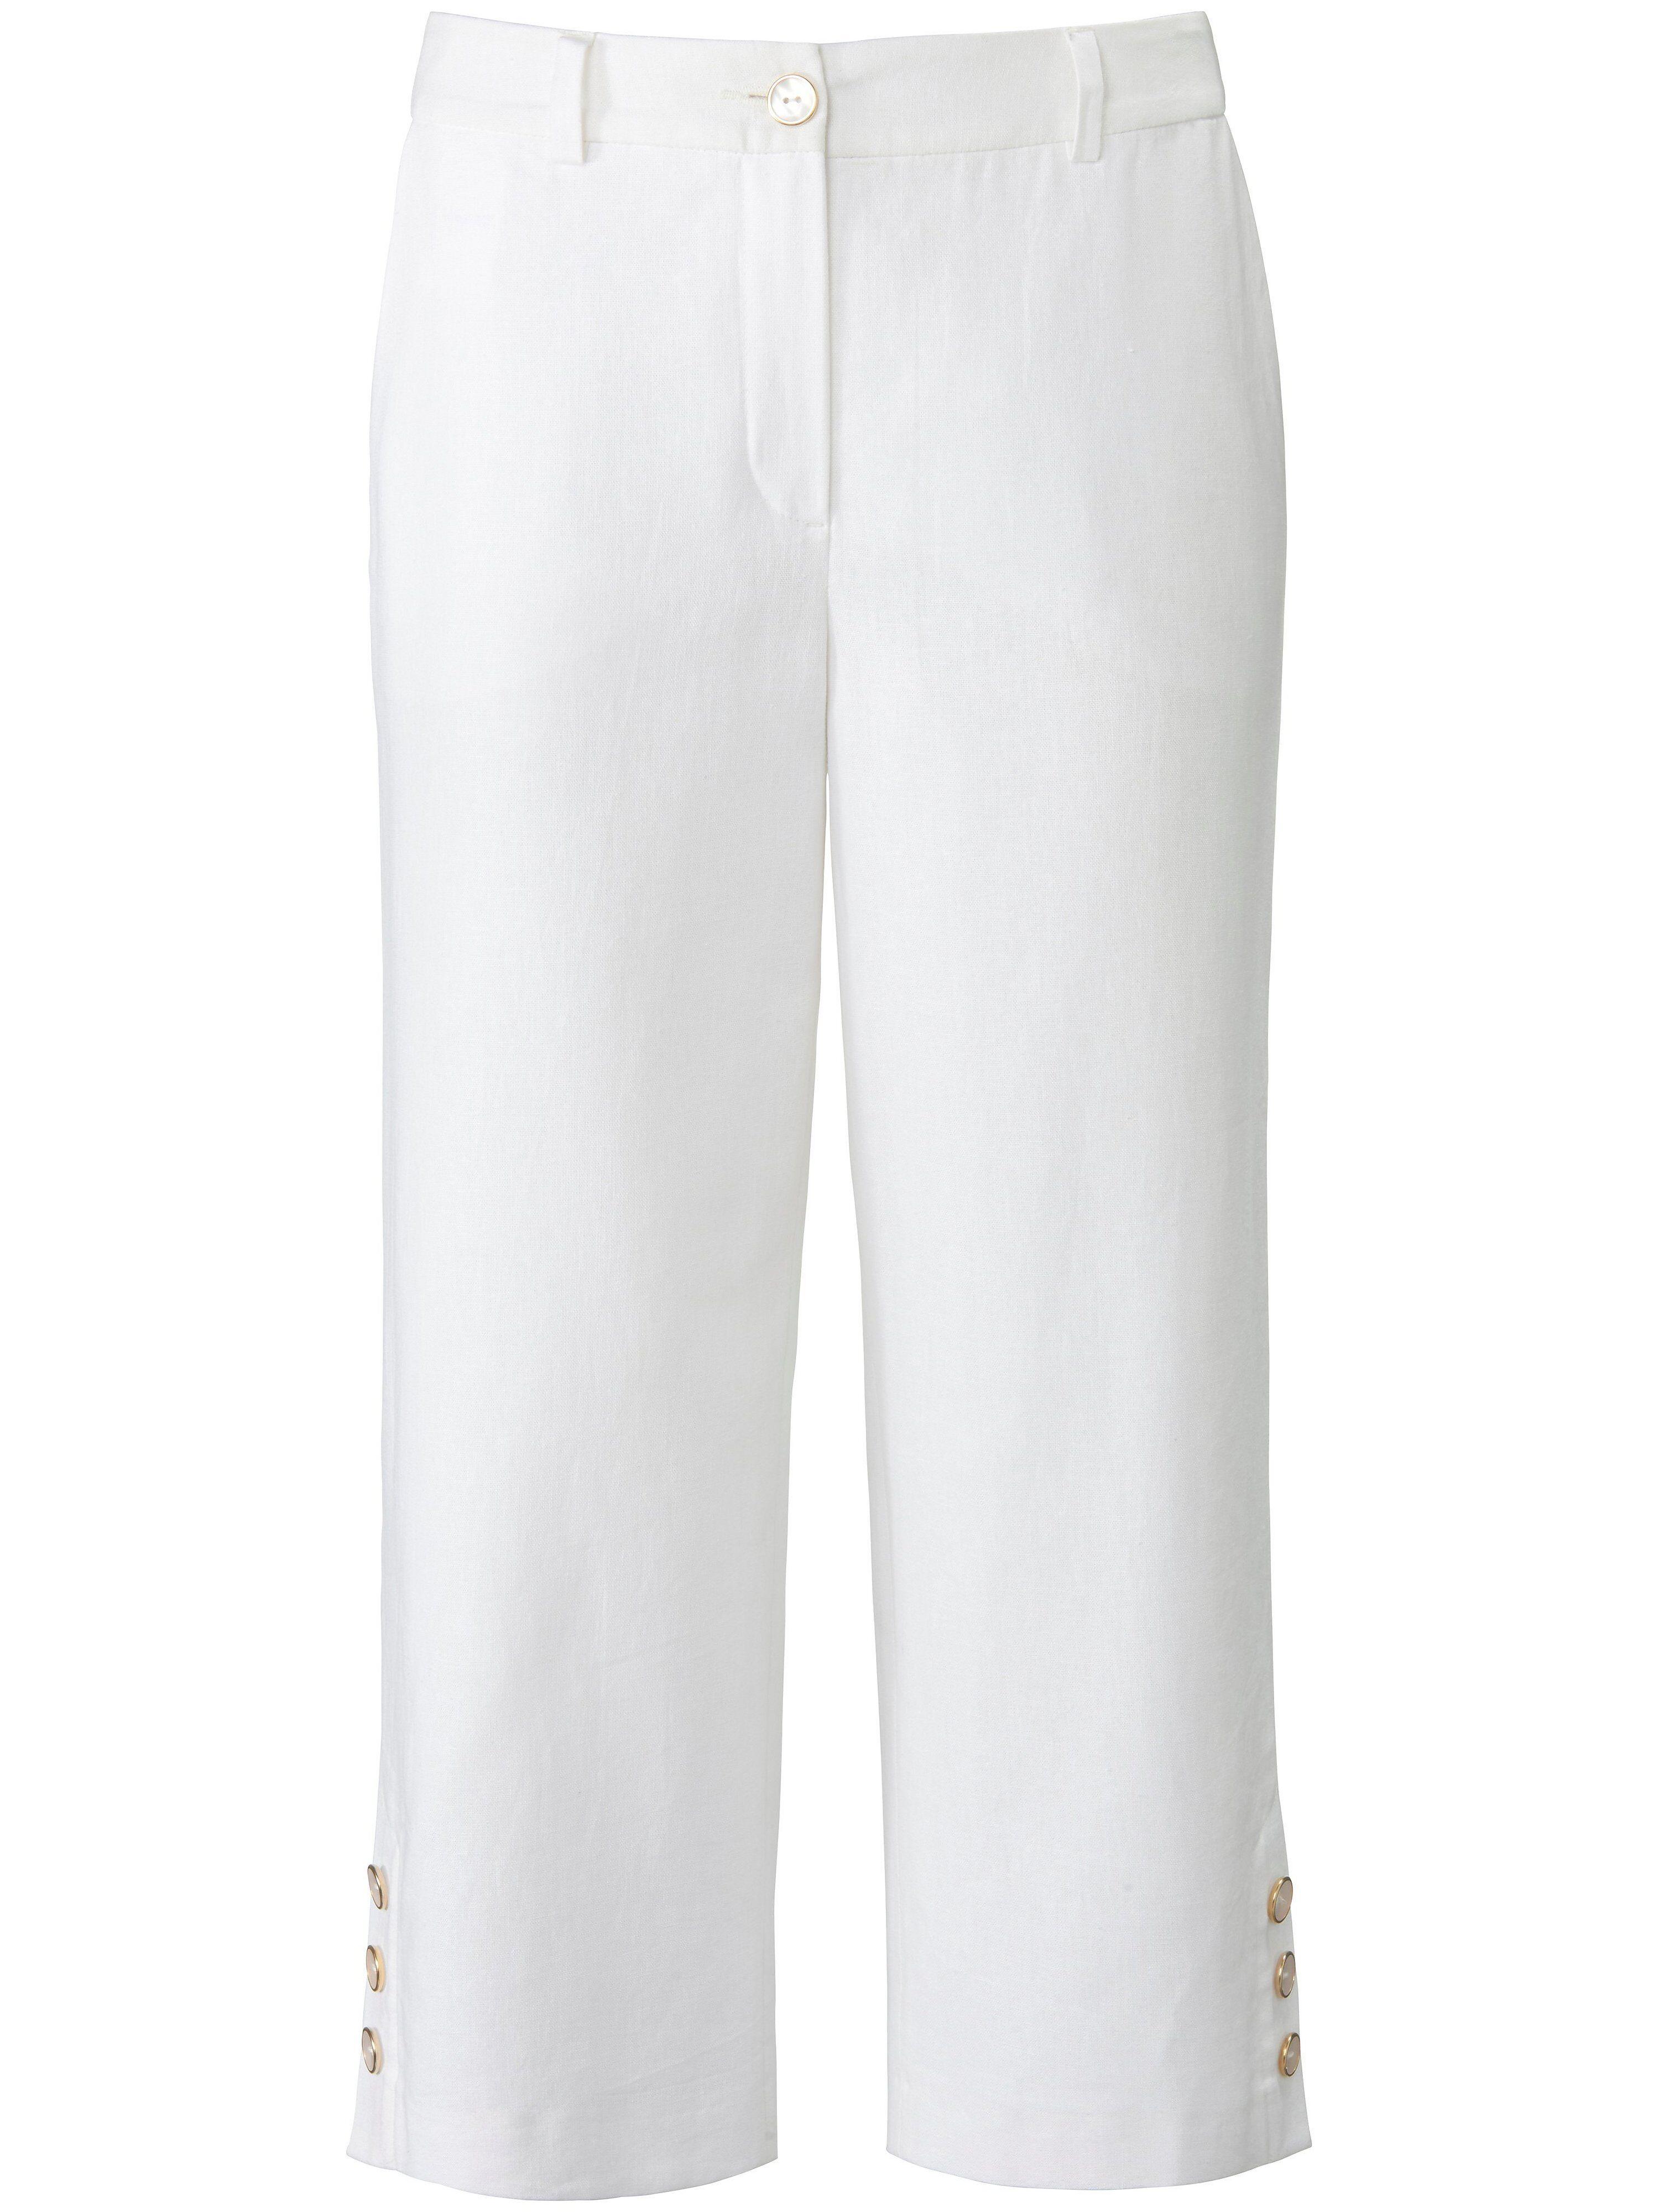 Uta Raasch La jupe-culotte avec ceinture à passants et bouton  Uta Raasch blanc  - Femme - 38